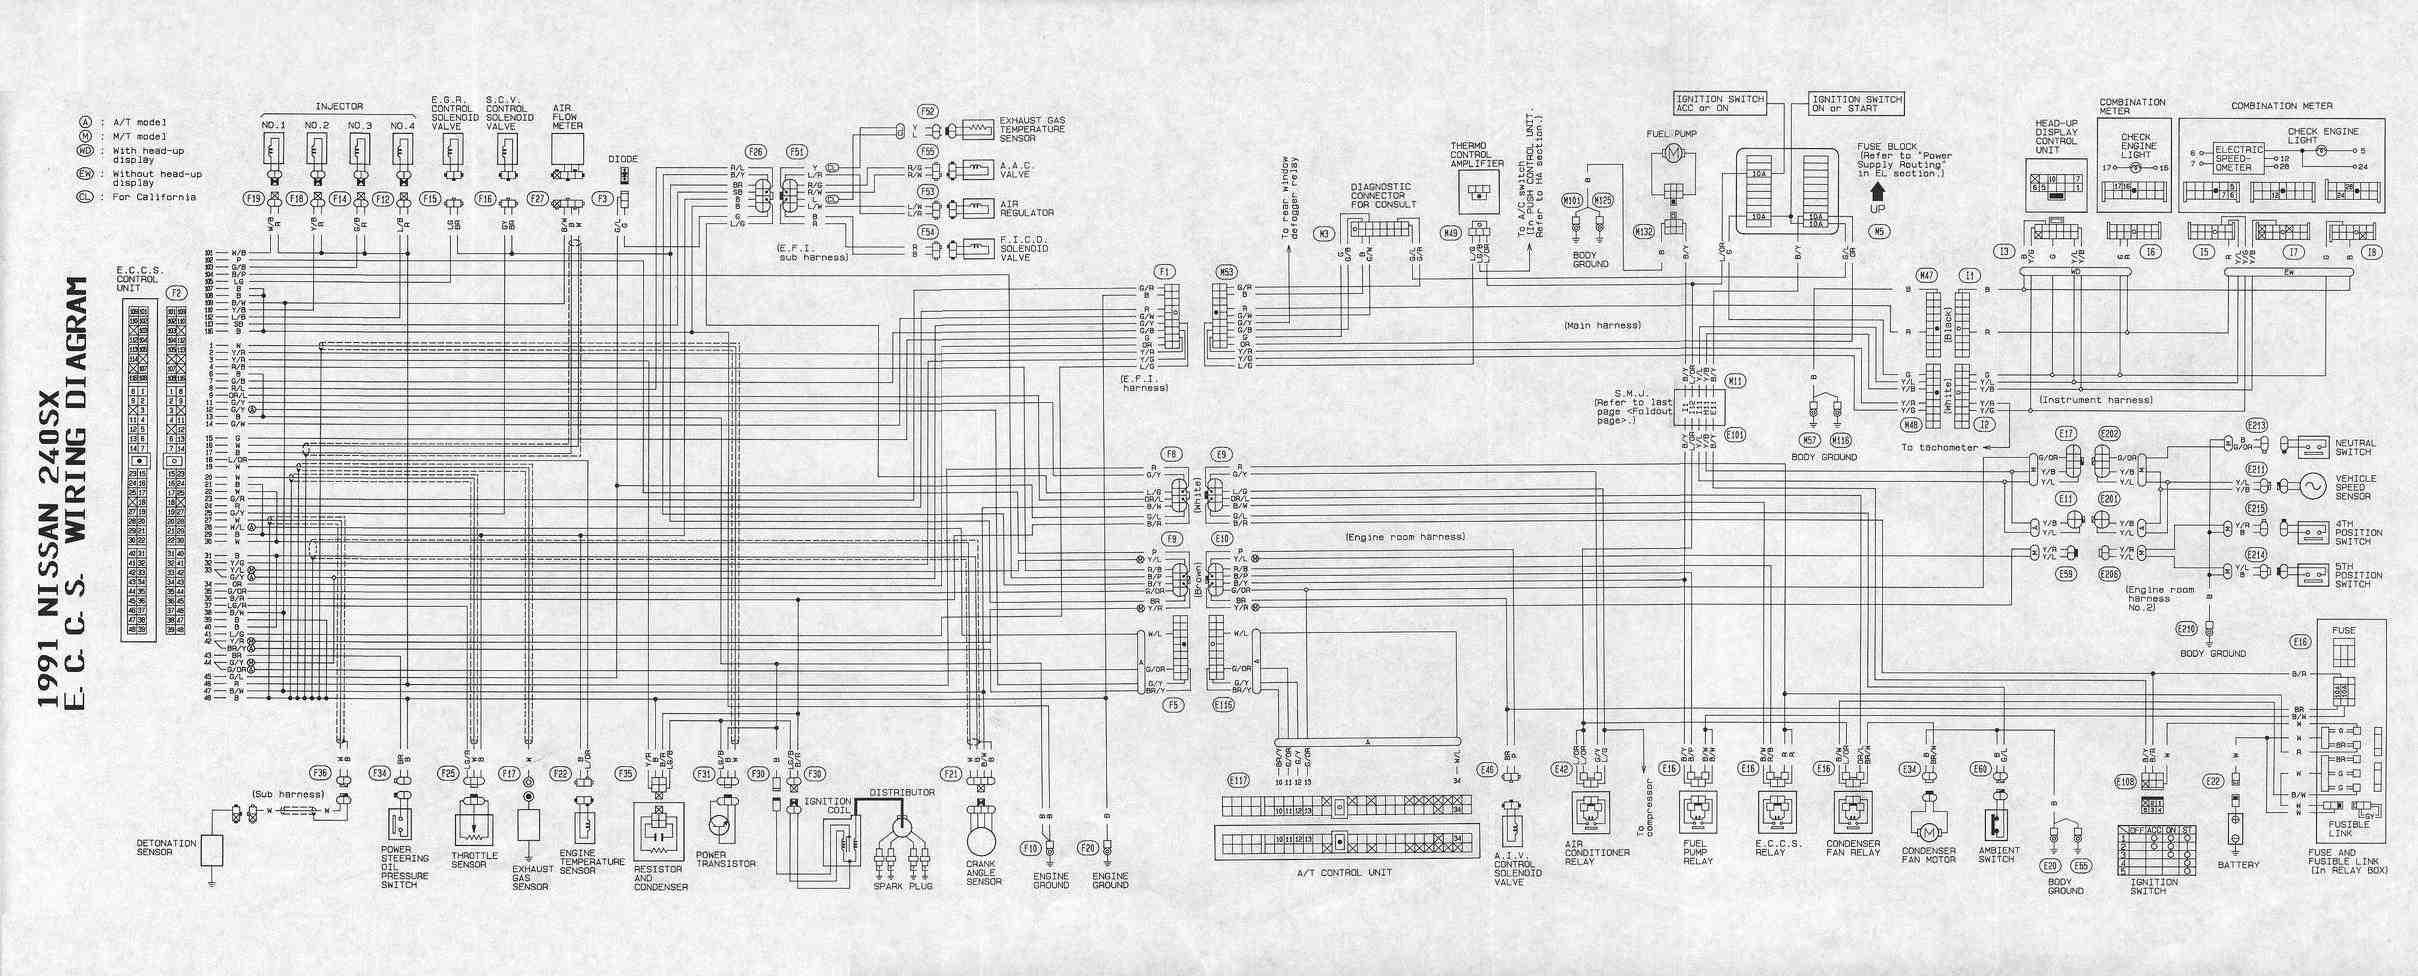 93 240sx Wiring Diagram - Wiring Diagrams on